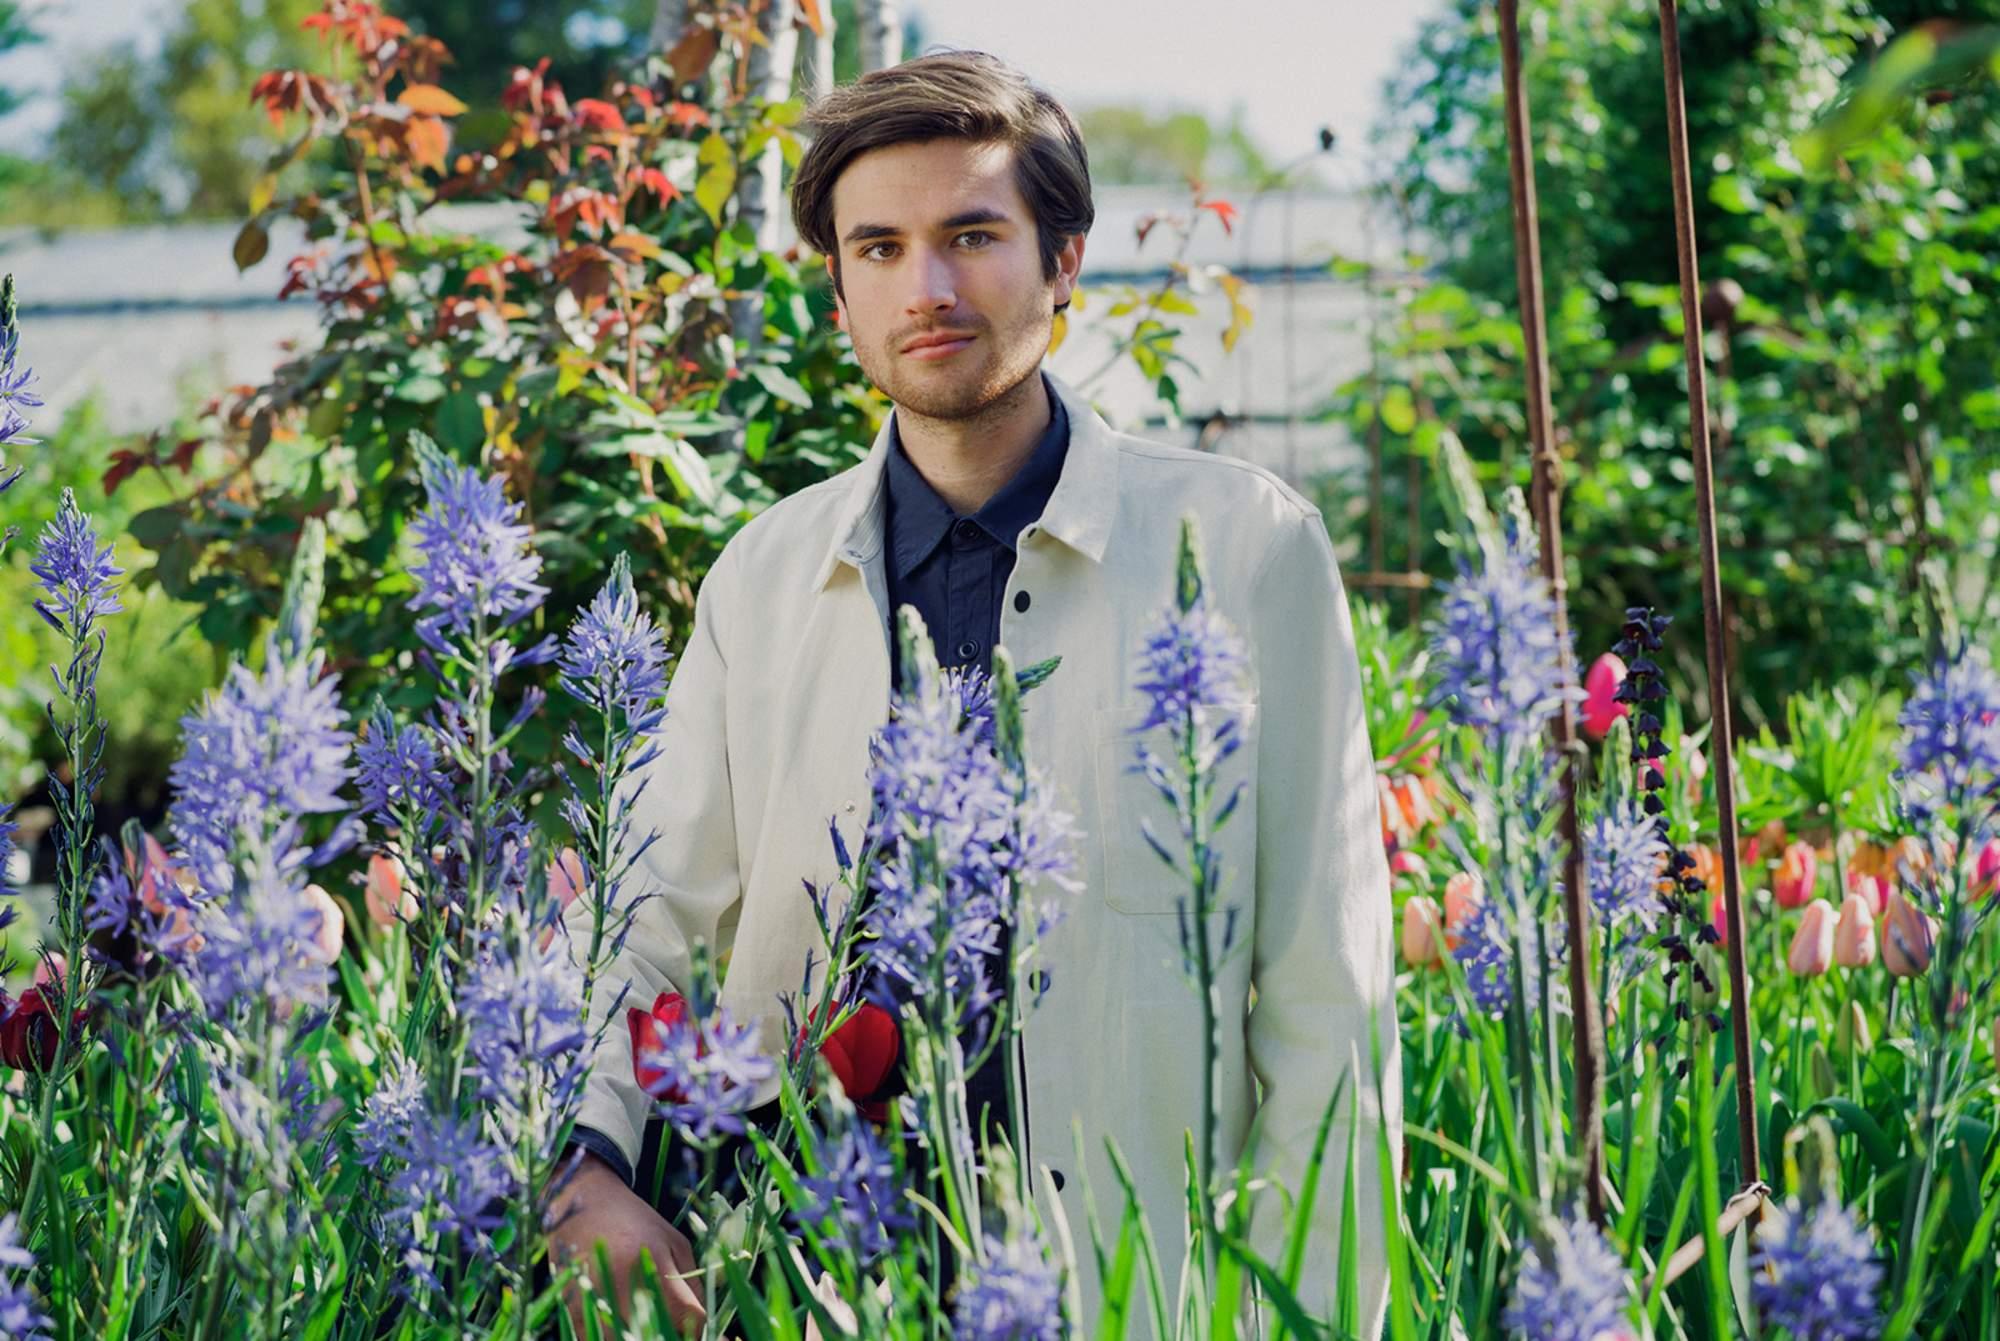 Alexander Hoyle, Mr Porter: The Men Who Like To Grow Things